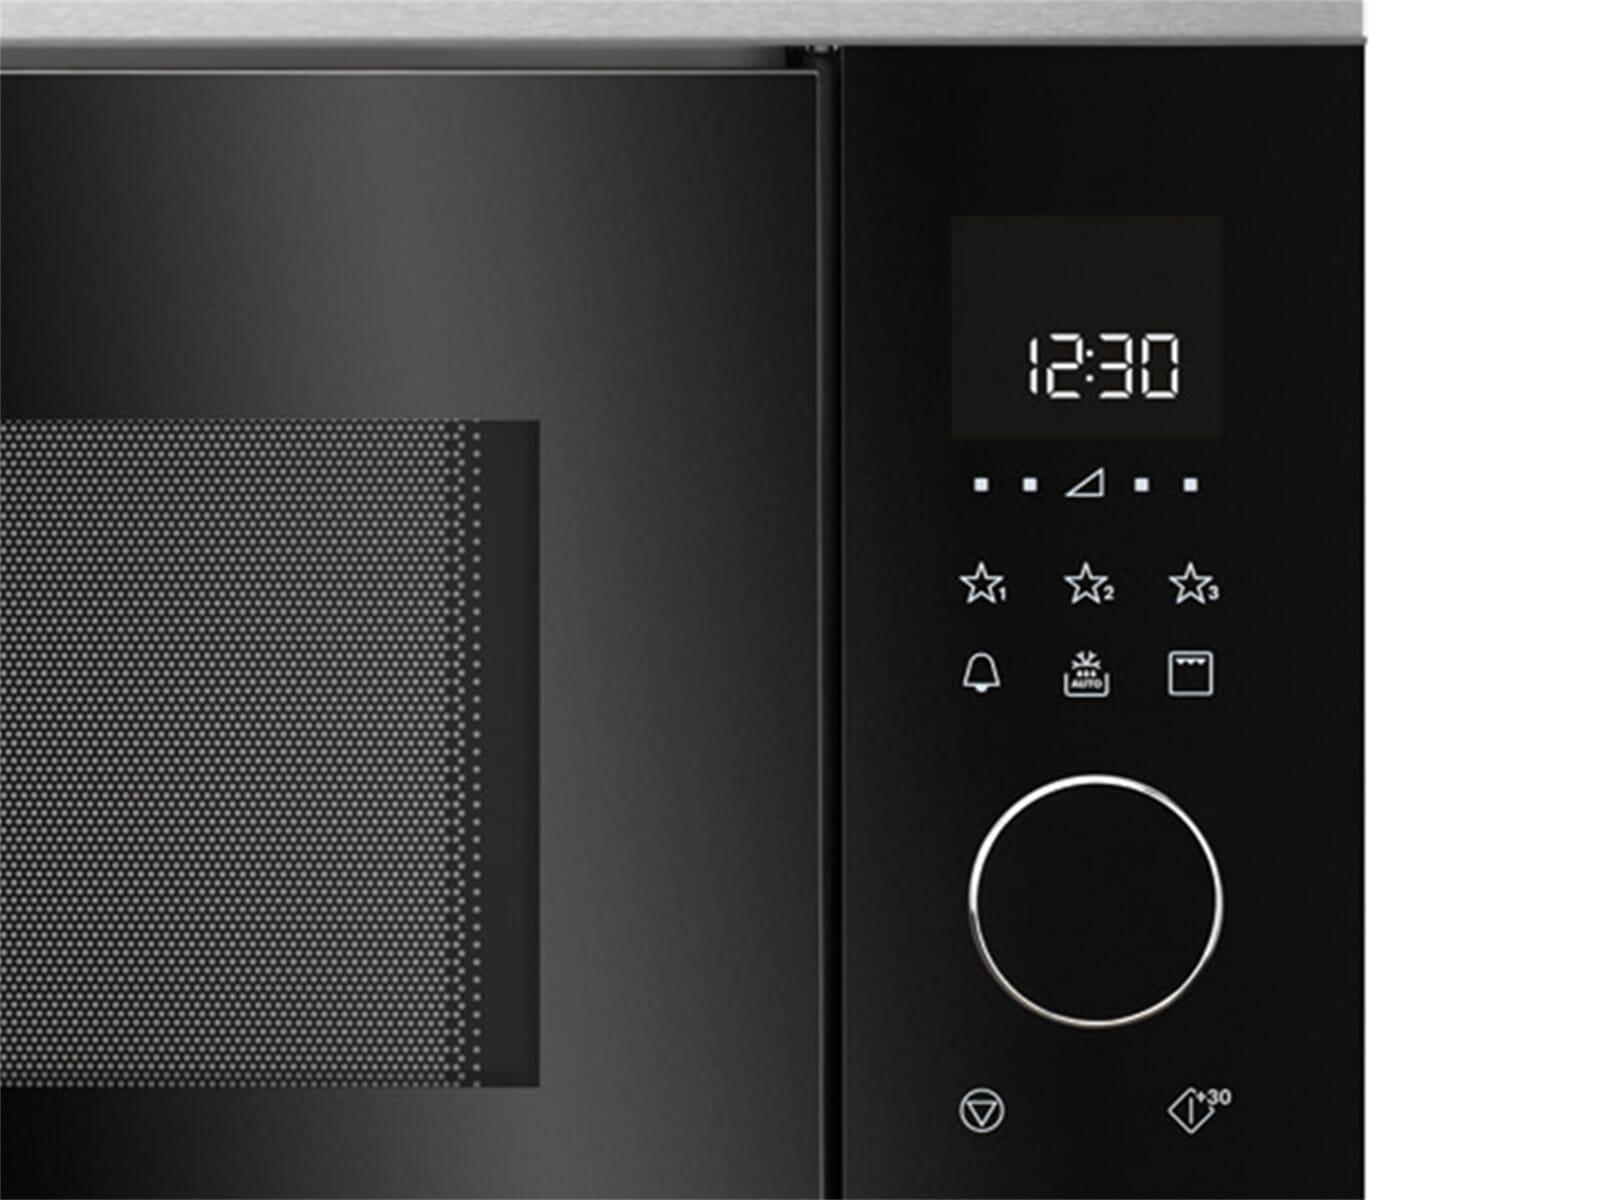 aeg mbb1755d m einbau mikrowelle edelstahl. Black Bedroom Furniture Sets. Home Design Ideas